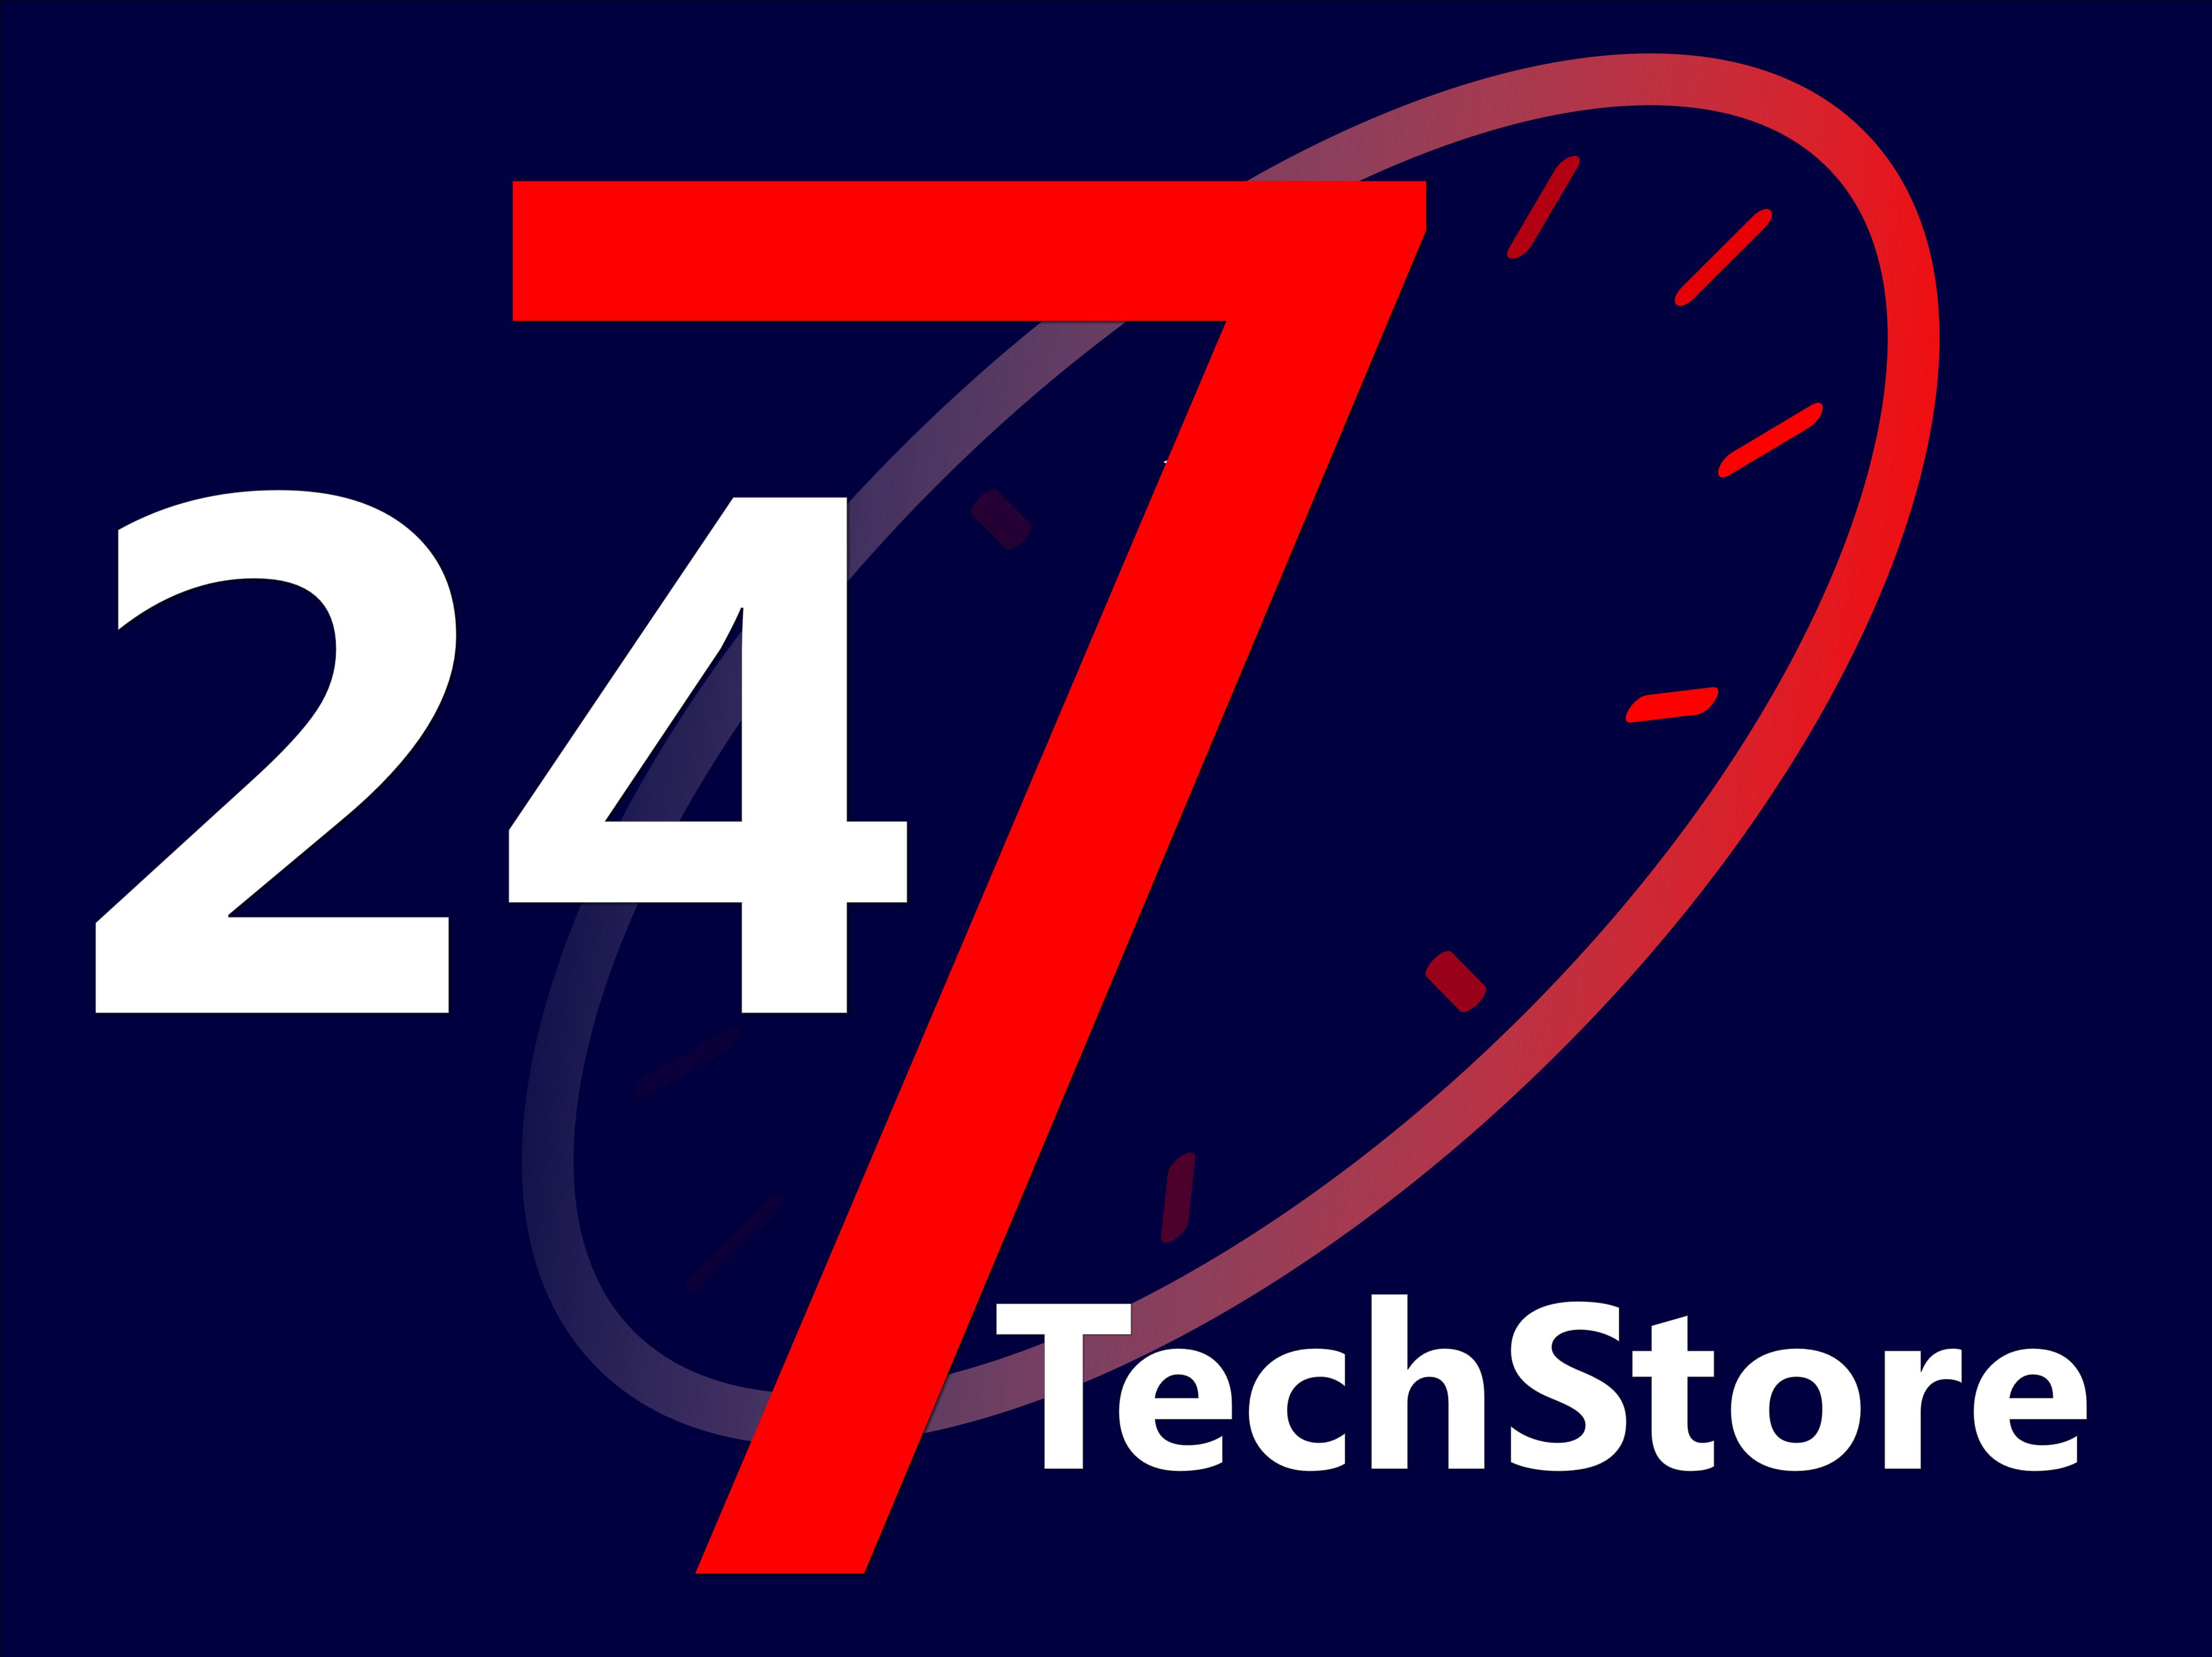 Logo247techstore blue background